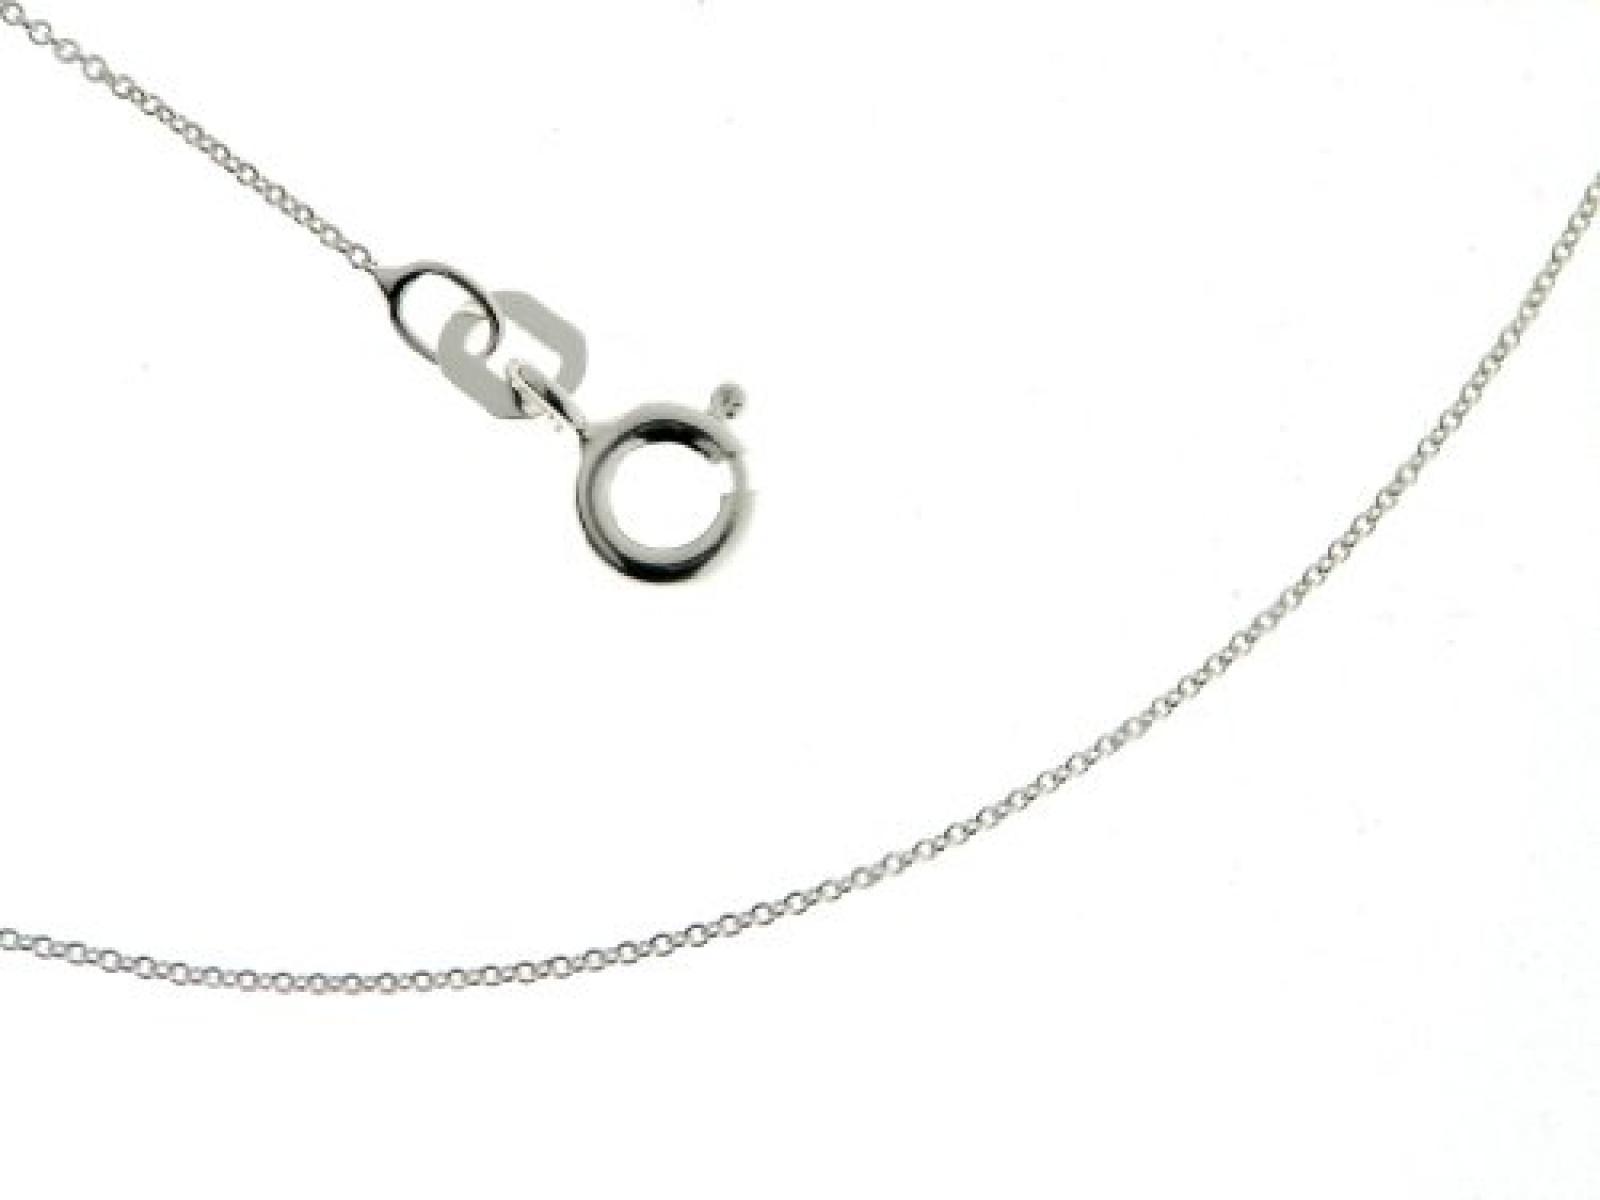 BOB C. Damen-Halskette ohne Anhänger Anker 925 Sterling Silber 326882